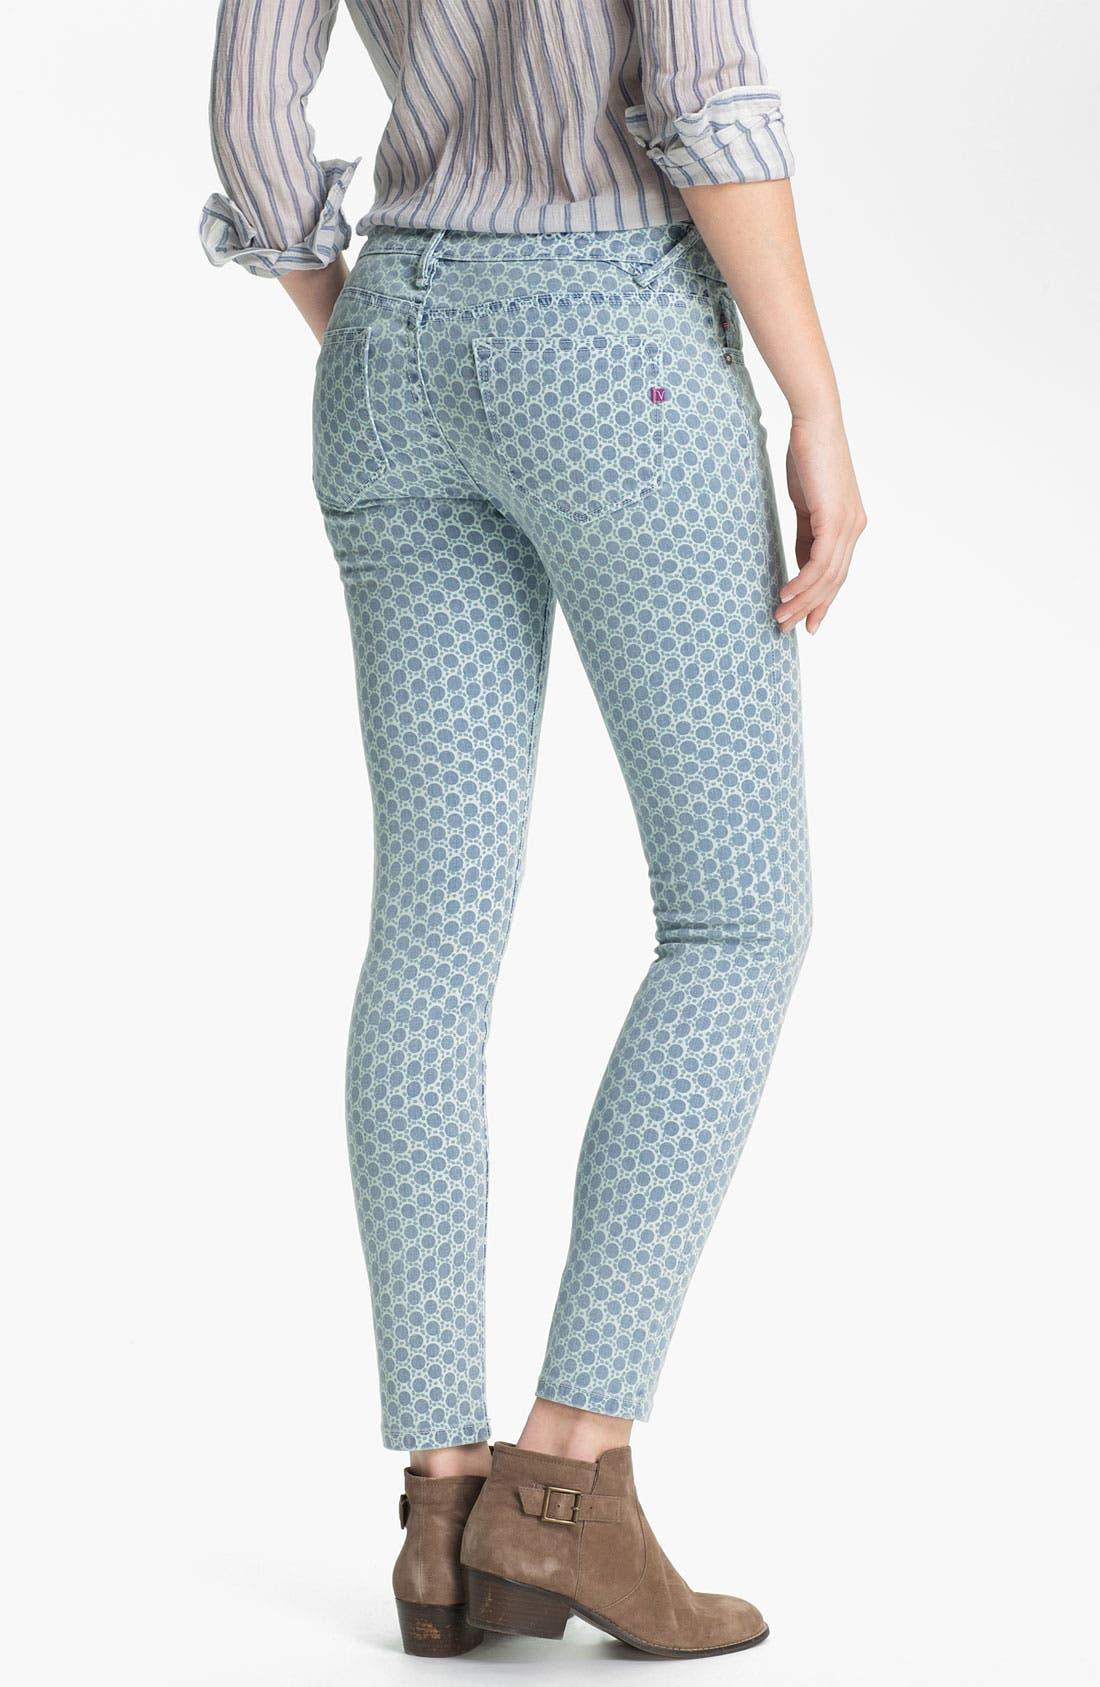 Main Image - Vigoss Print Skinny Jeans (Blue Dot) (Juniors)